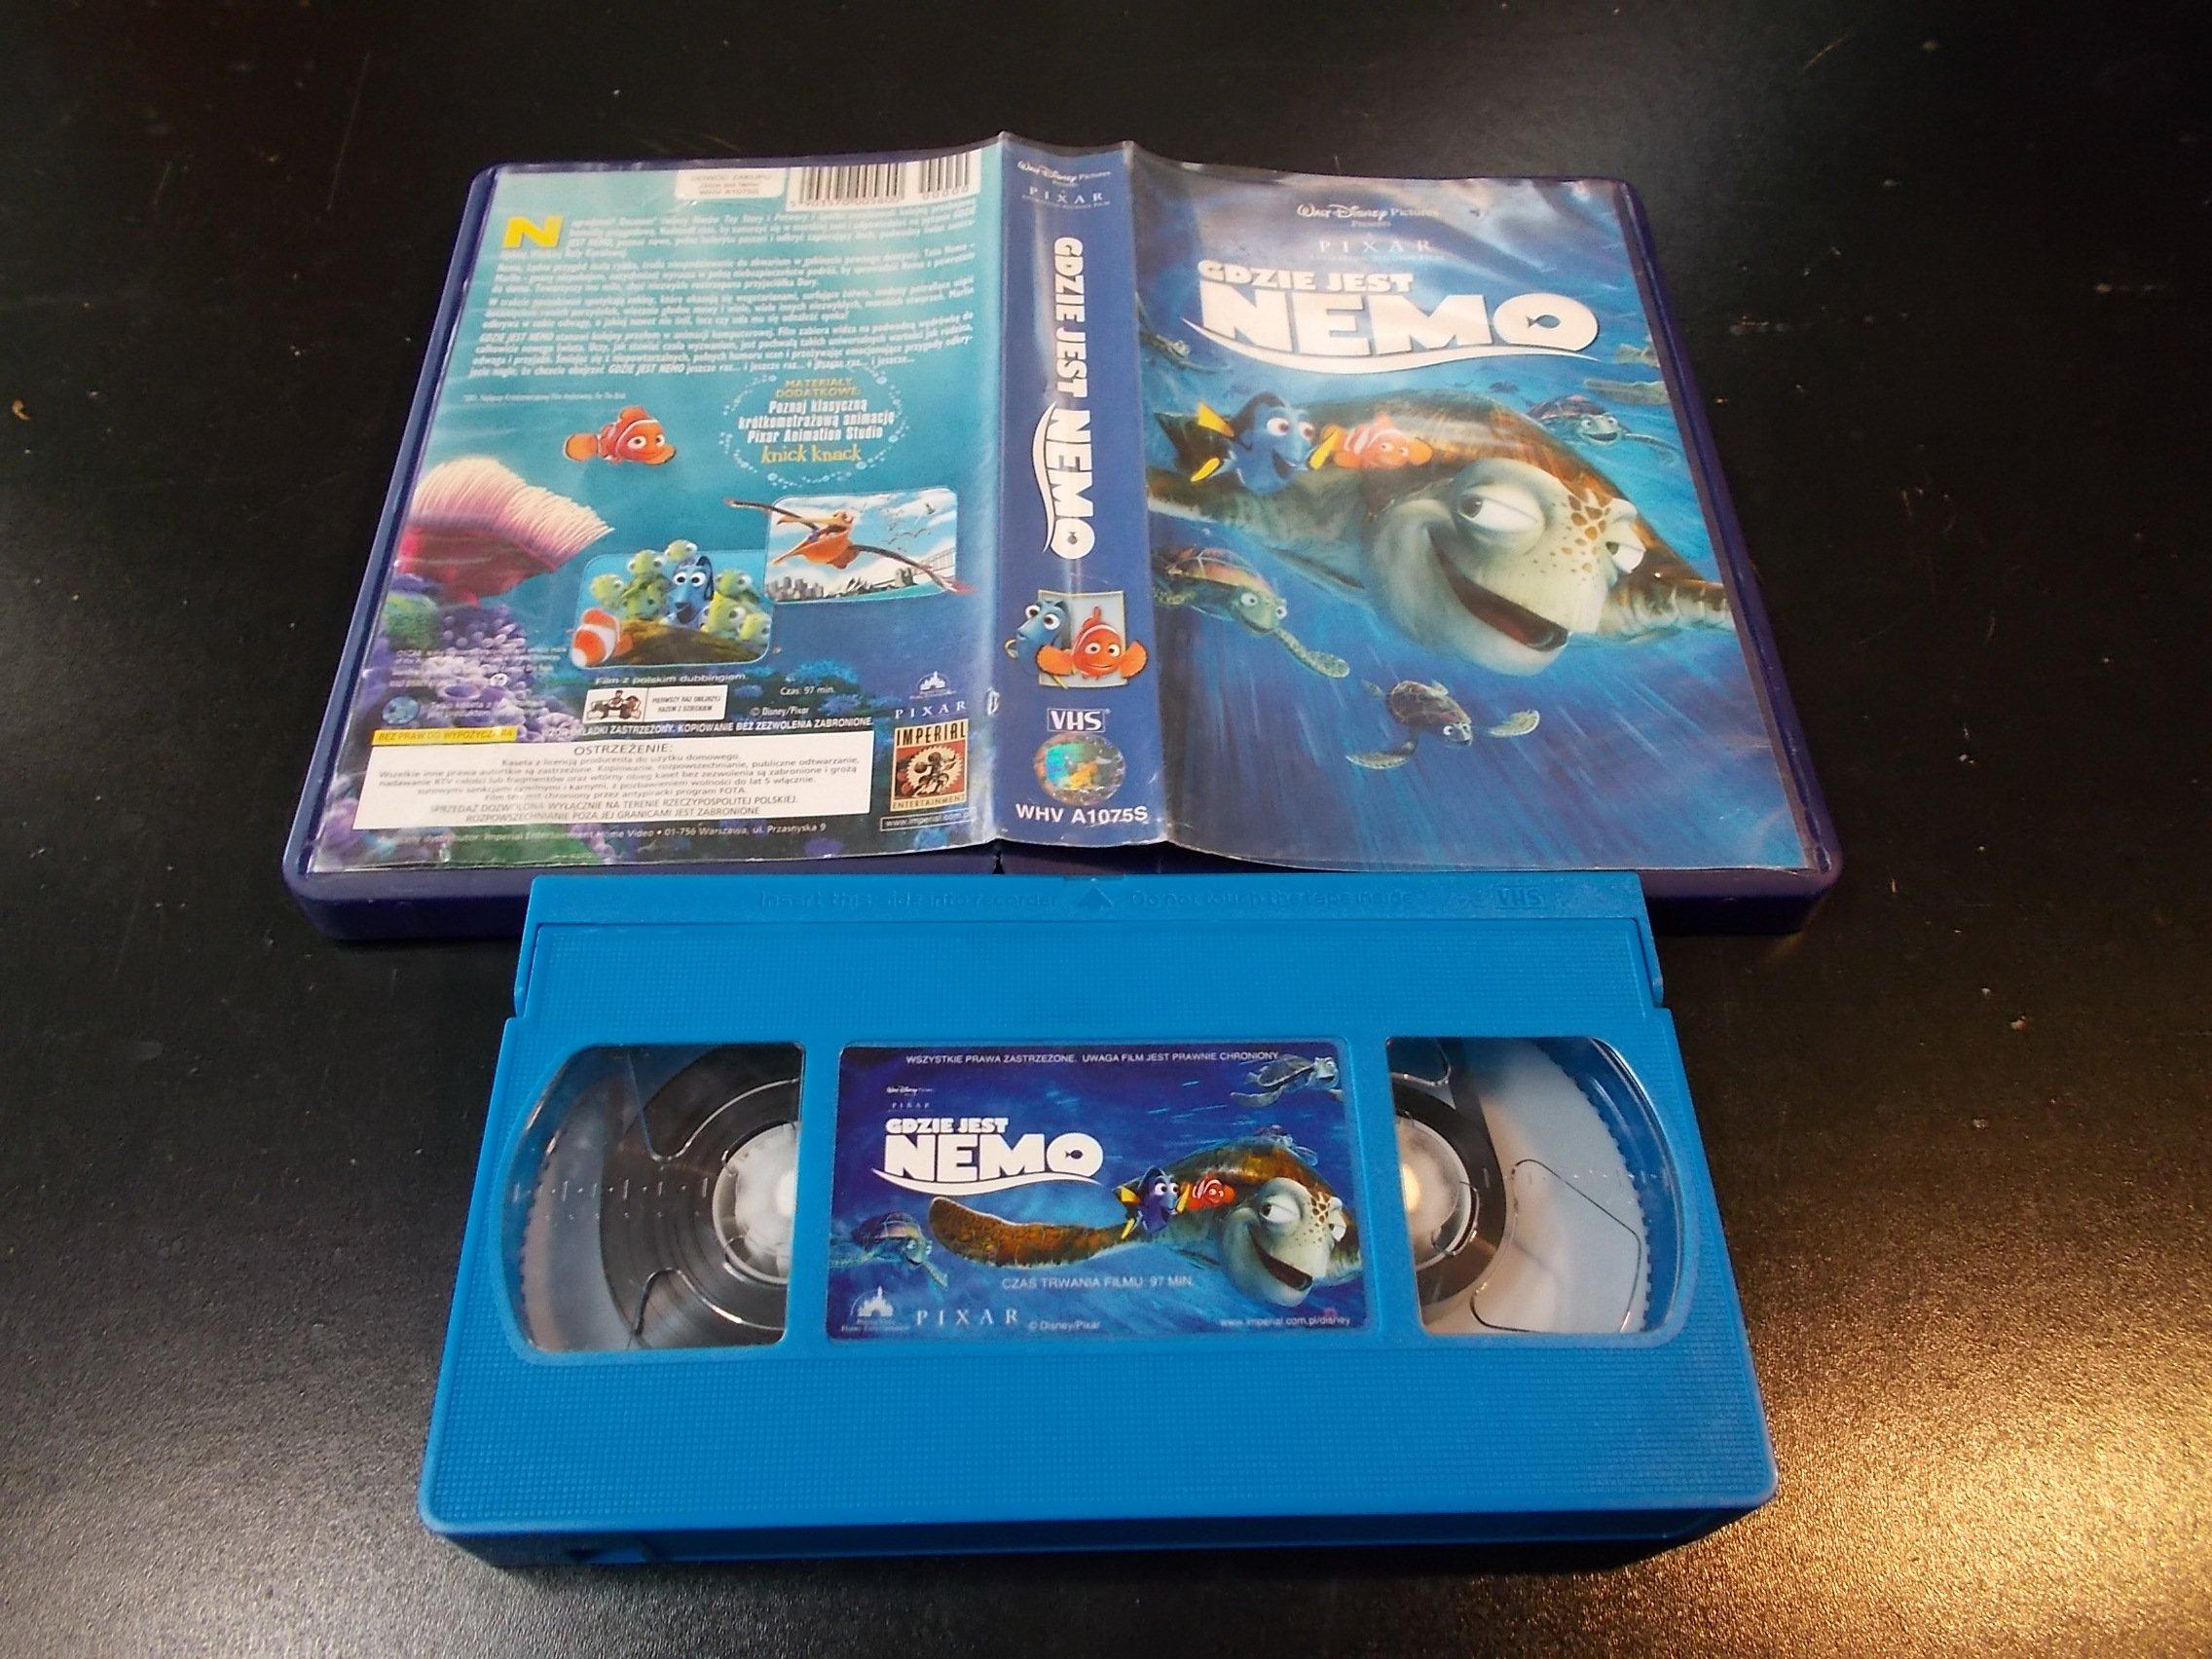 GDZIE JEST NEMO - kaseta Video VHS - 1343 Sklep